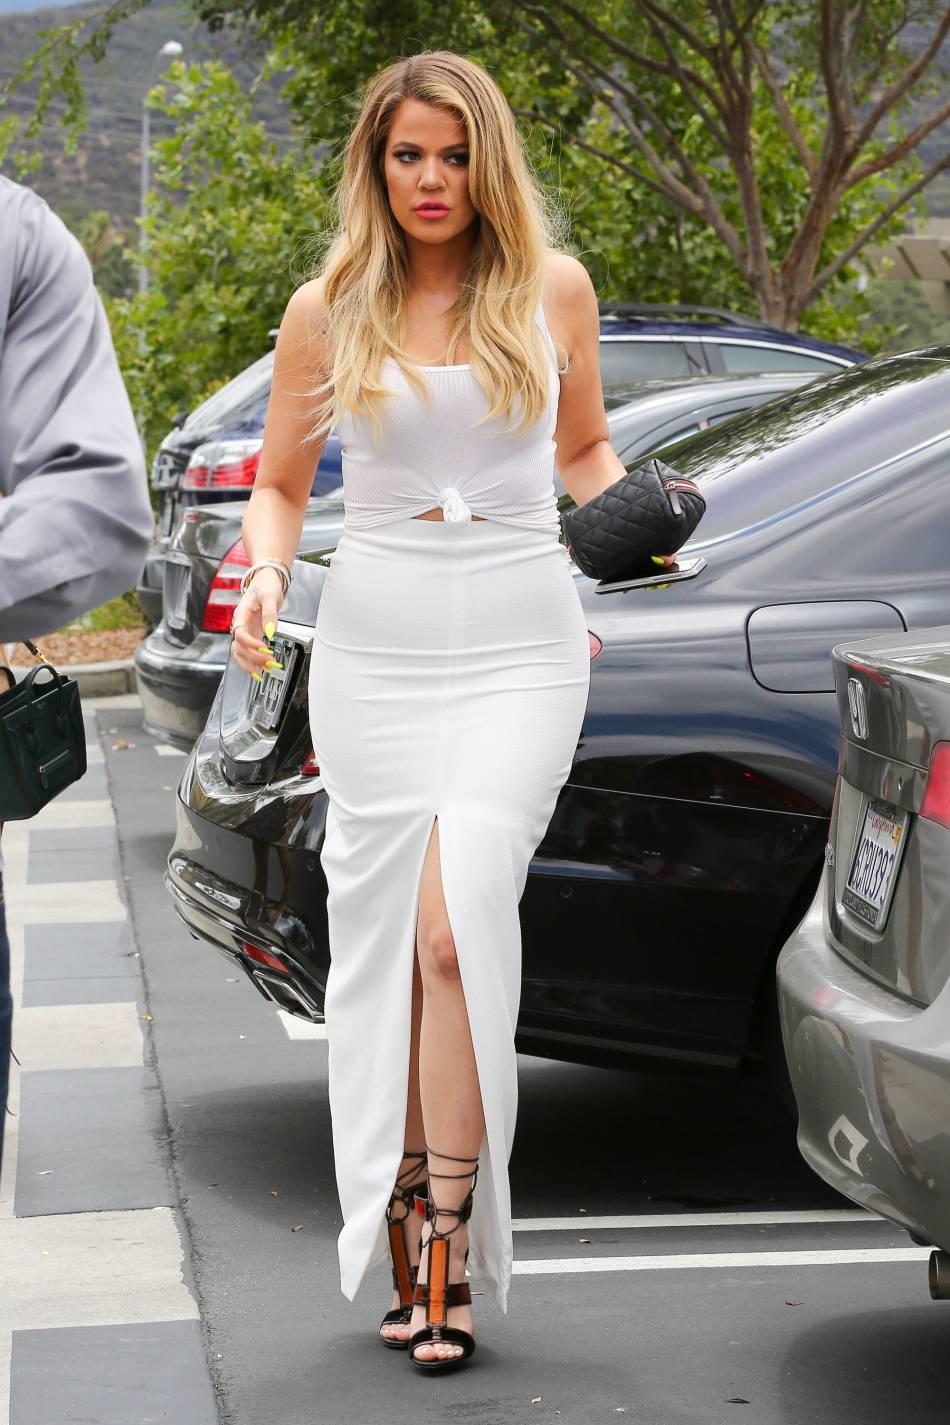 Khloe Kardashian rayonnante dans cette tenue blanche - Puretrend da1e1b06ef98